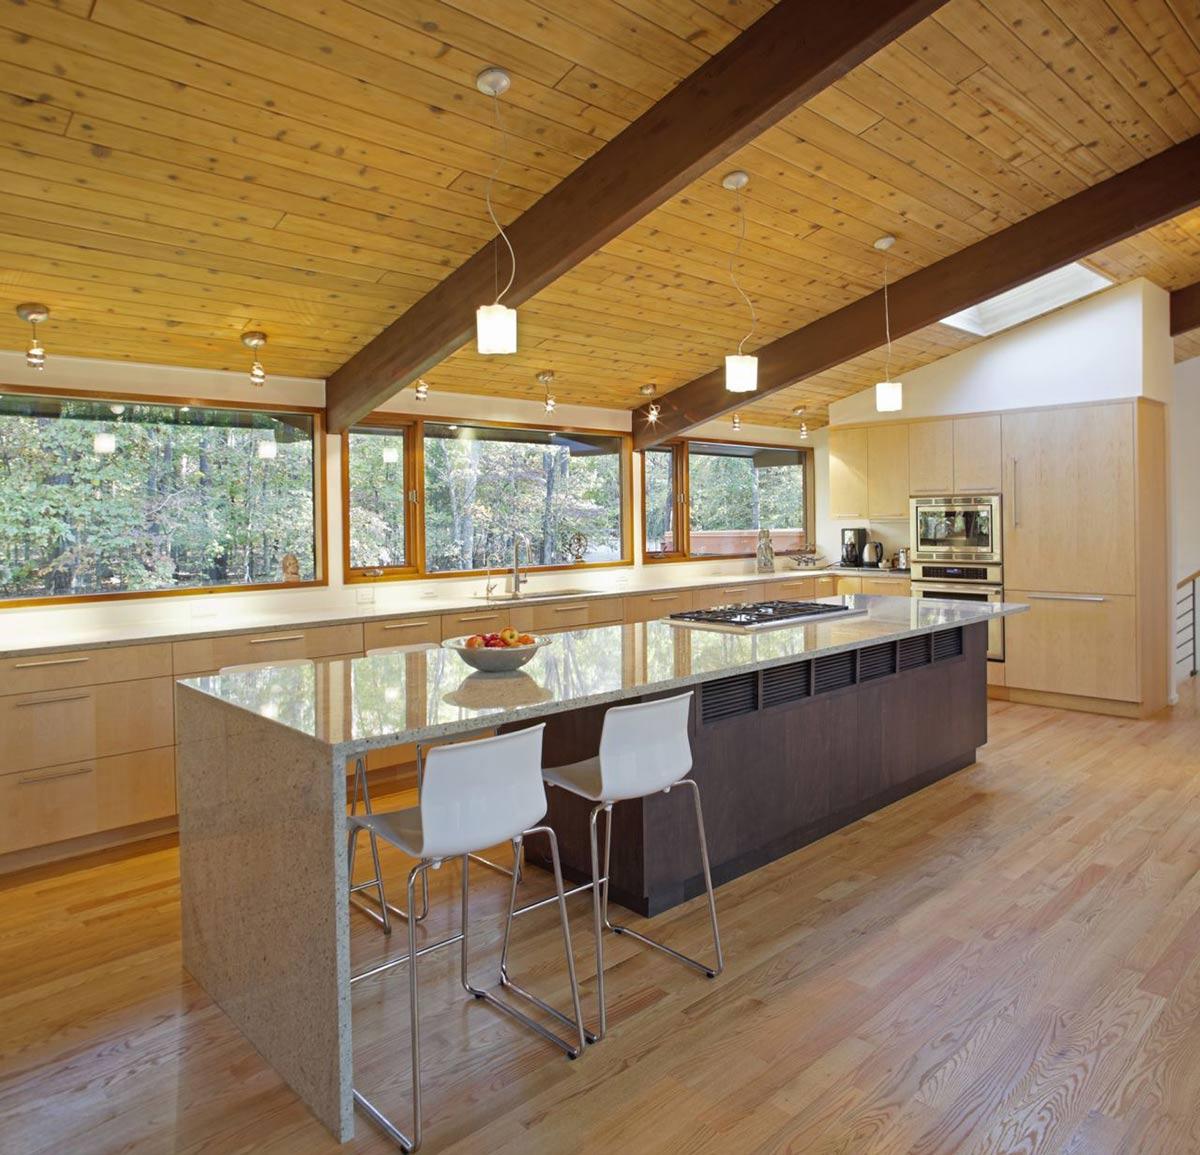 Kitchen Island, Breakfast Table, Deck House Renovation in